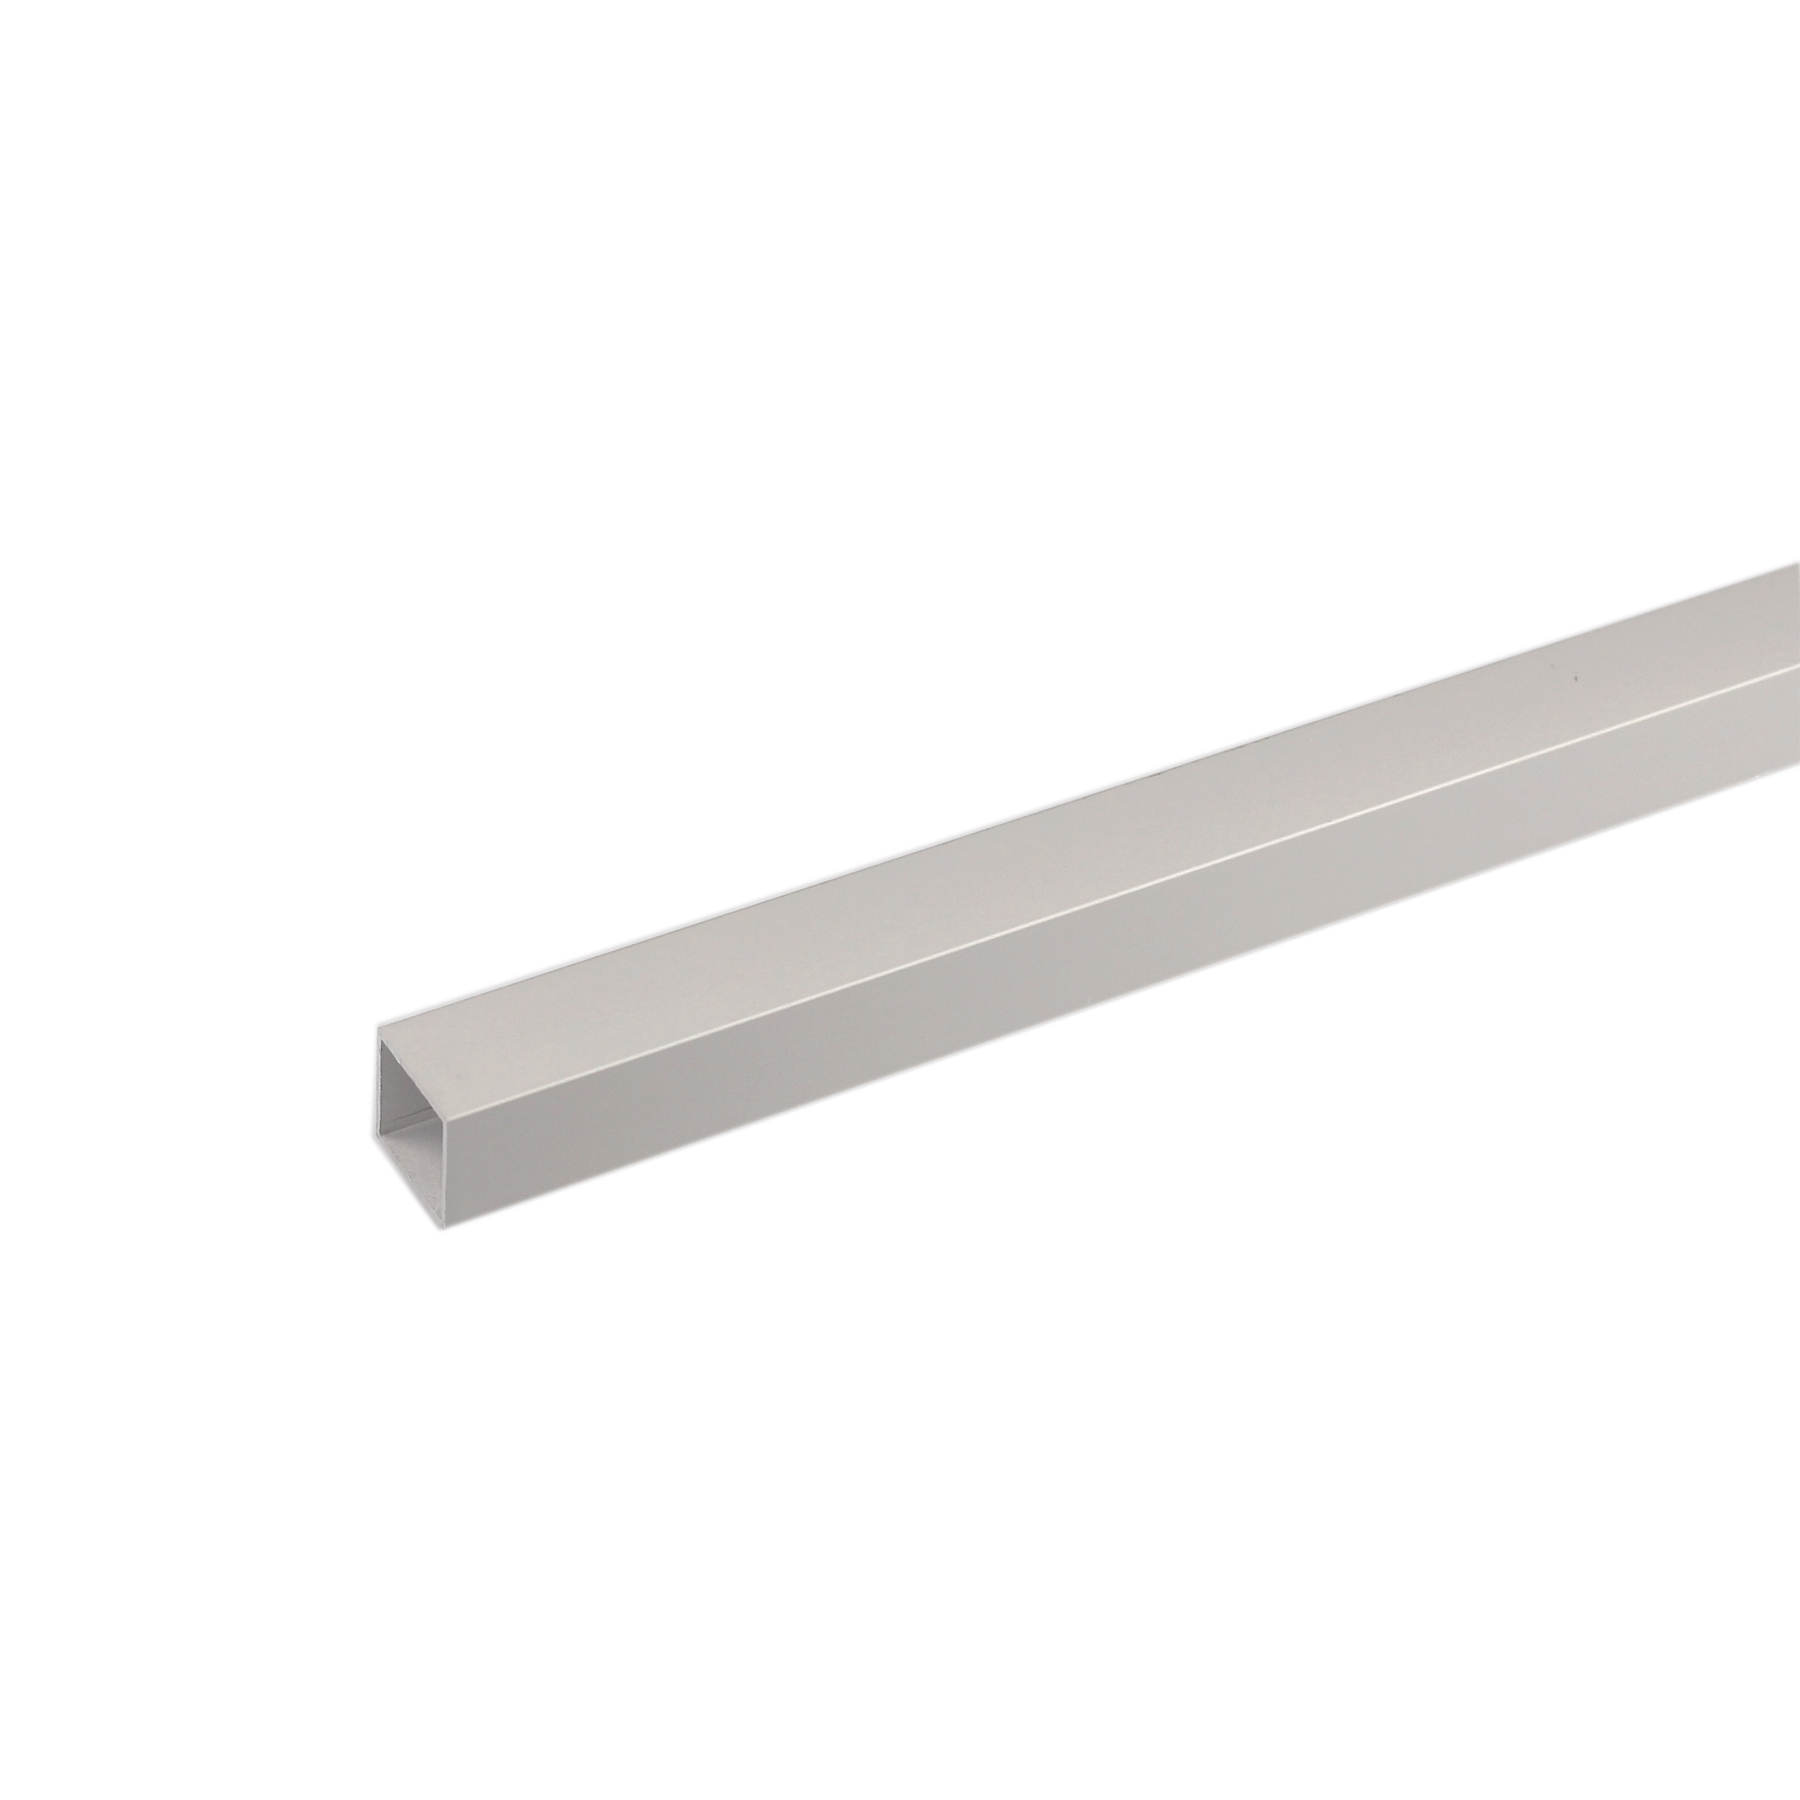 Perfil alum nio tubo quadrado 2mx10x10mm anodizado leroy for Tubo irrigazione leroy merlin